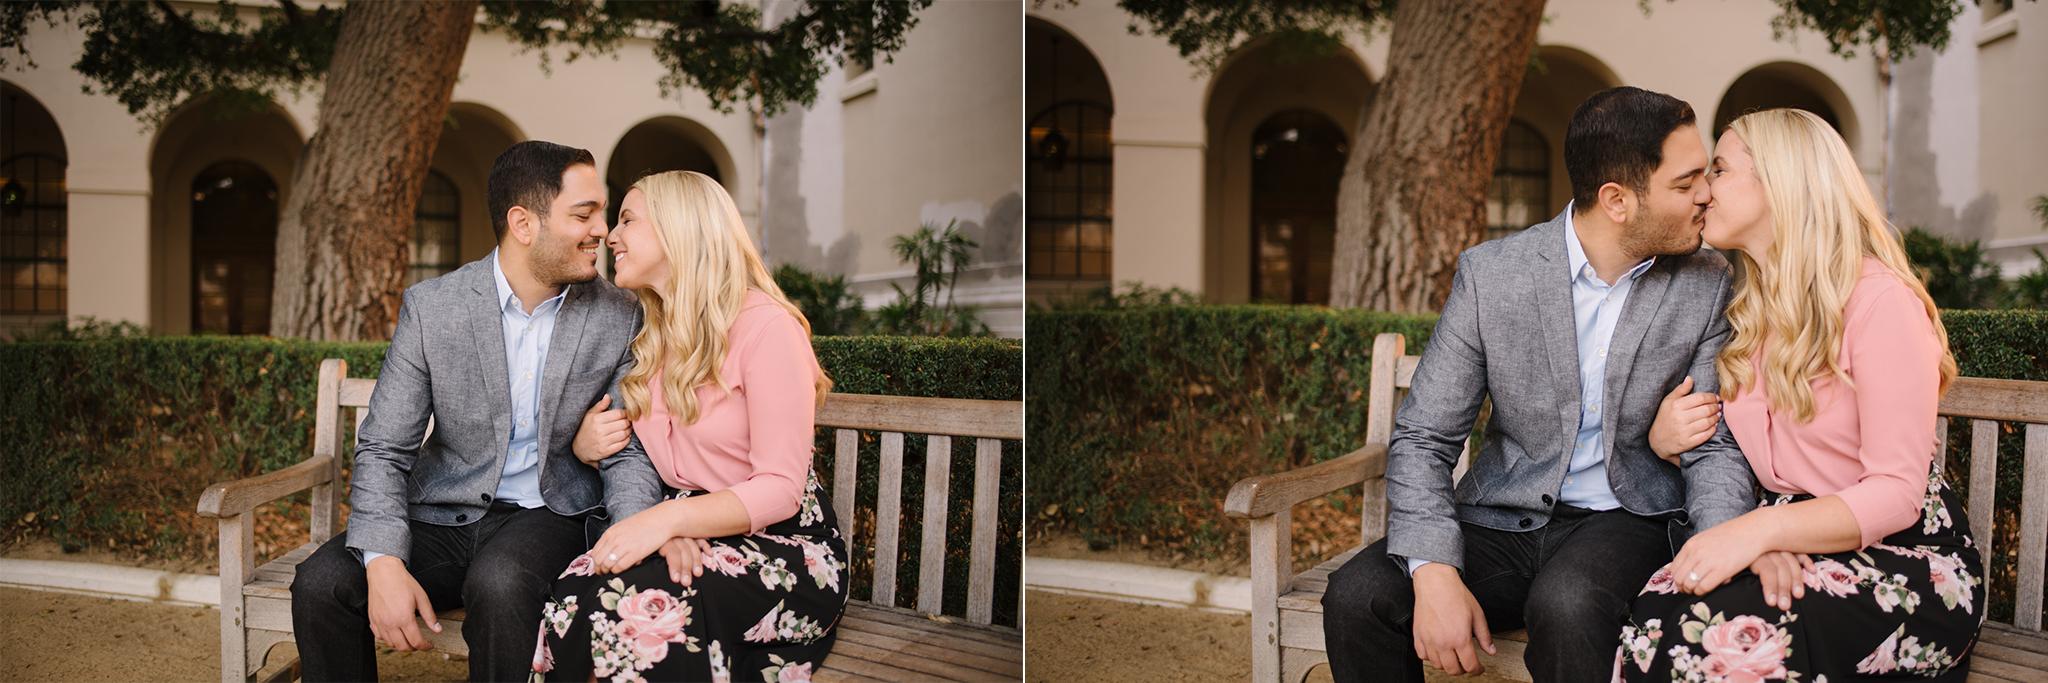 0013-JM-Pasadena-City-Hall-Los-Angeles-County-Engagement-Photography